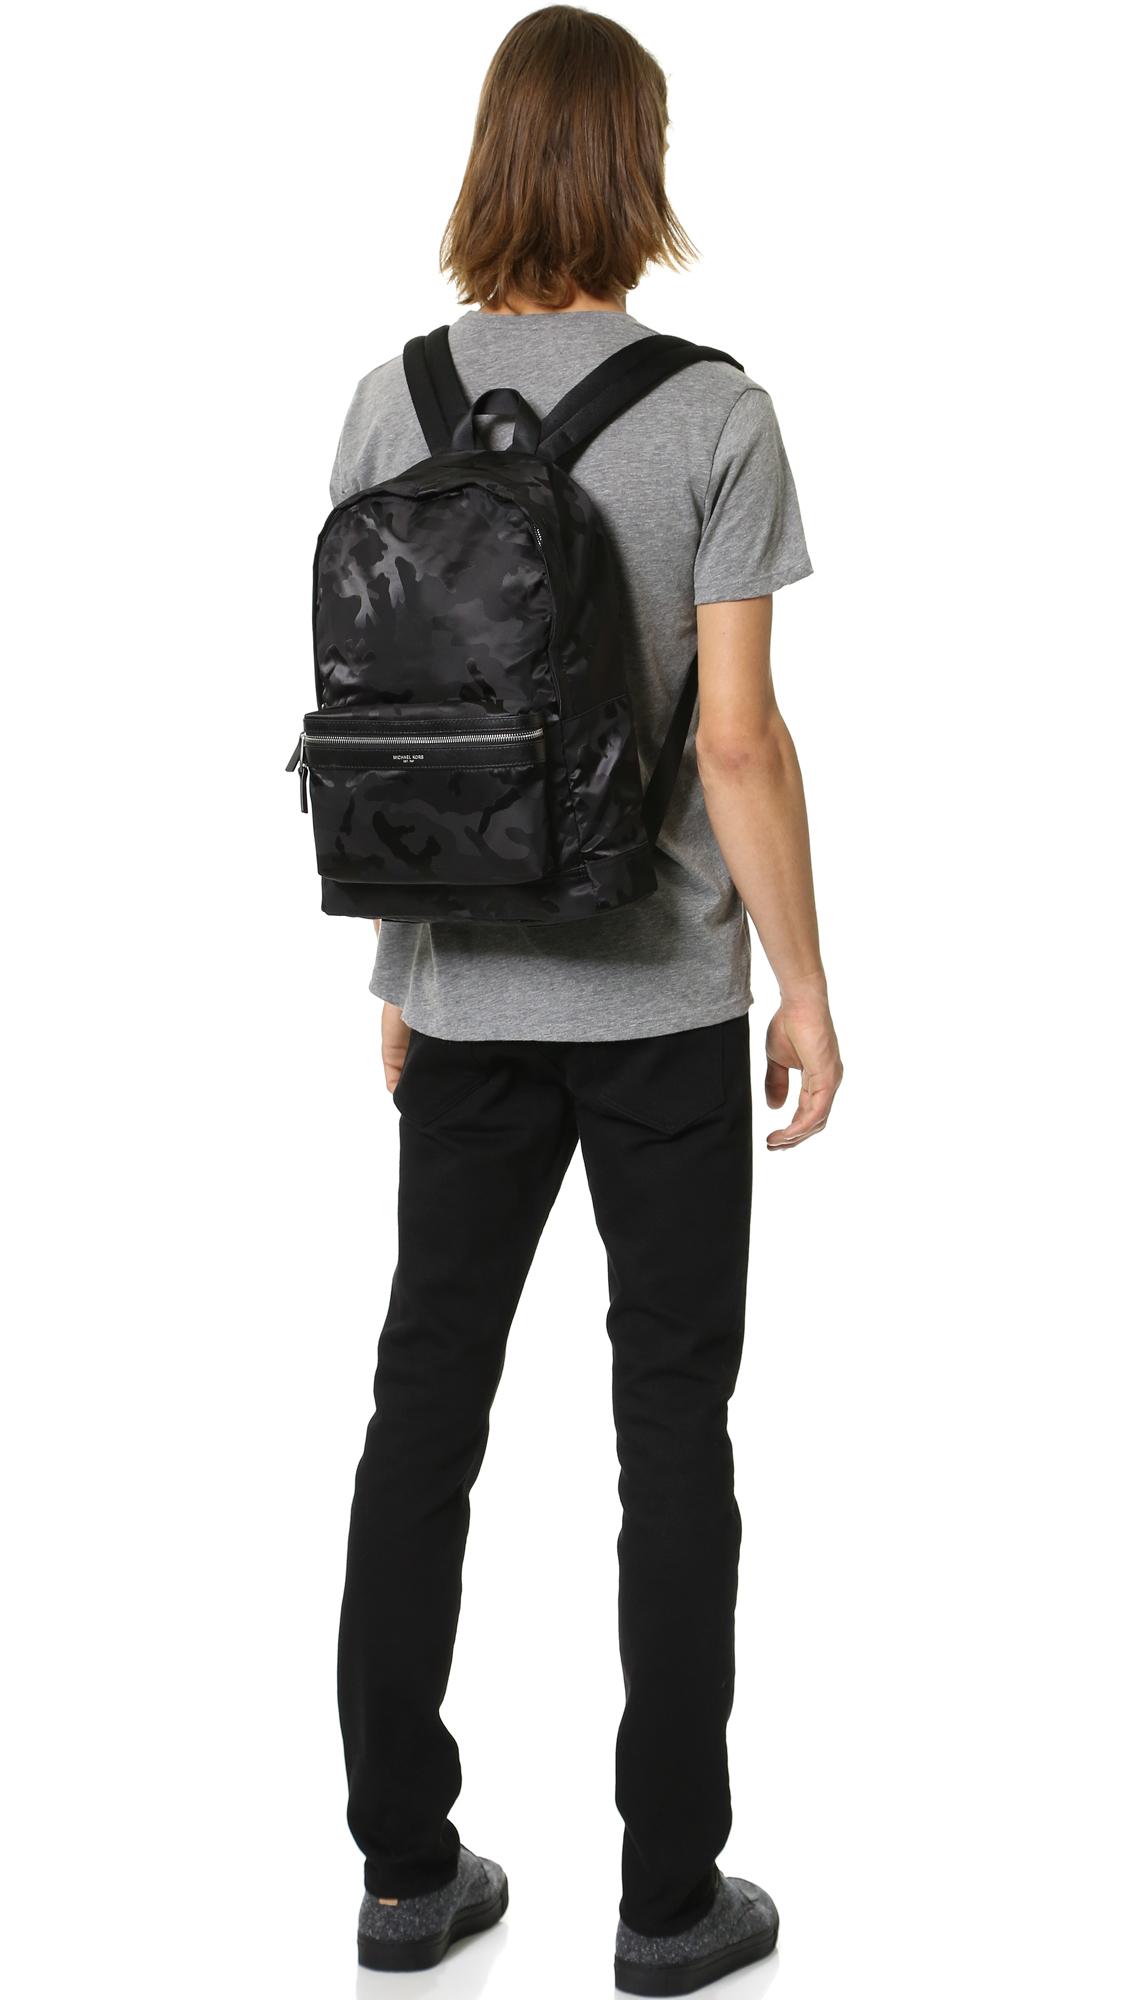 eed6bfef26f6 Michael Kors Kent Camo Nylon Backpack in Black for Men - Lyst